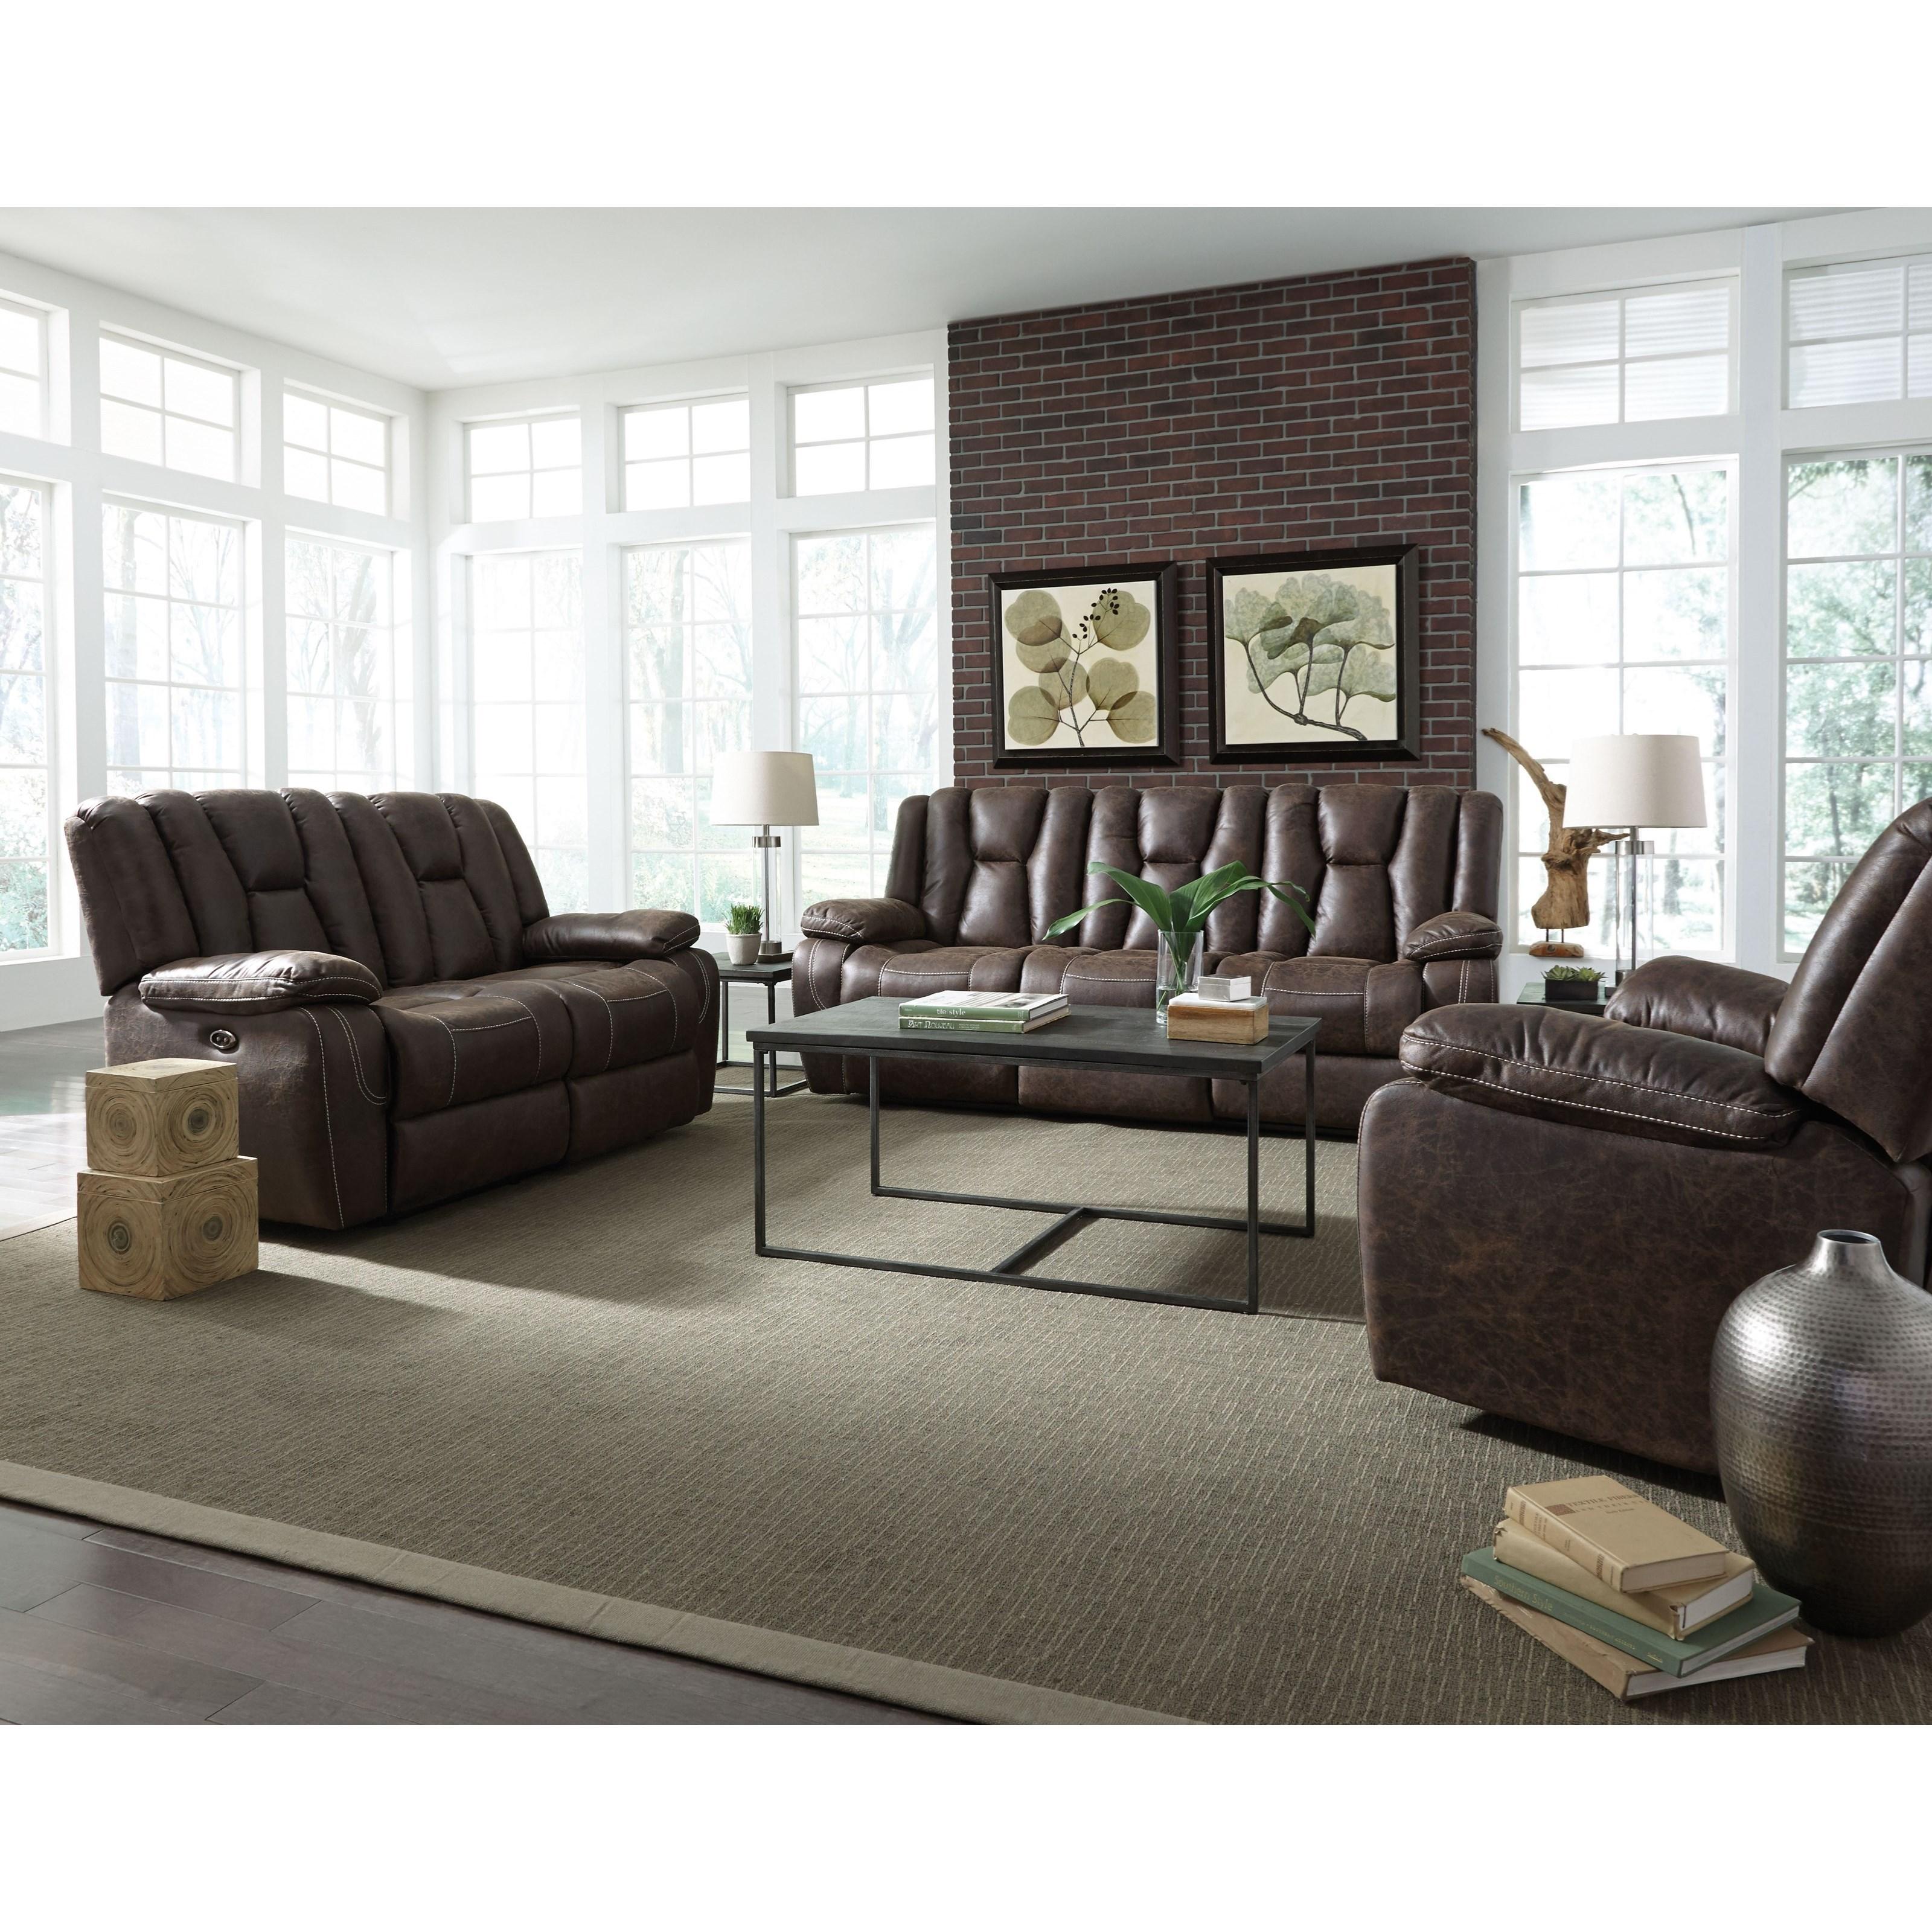 Standard Furniture Rainier Power Reclining Living Room